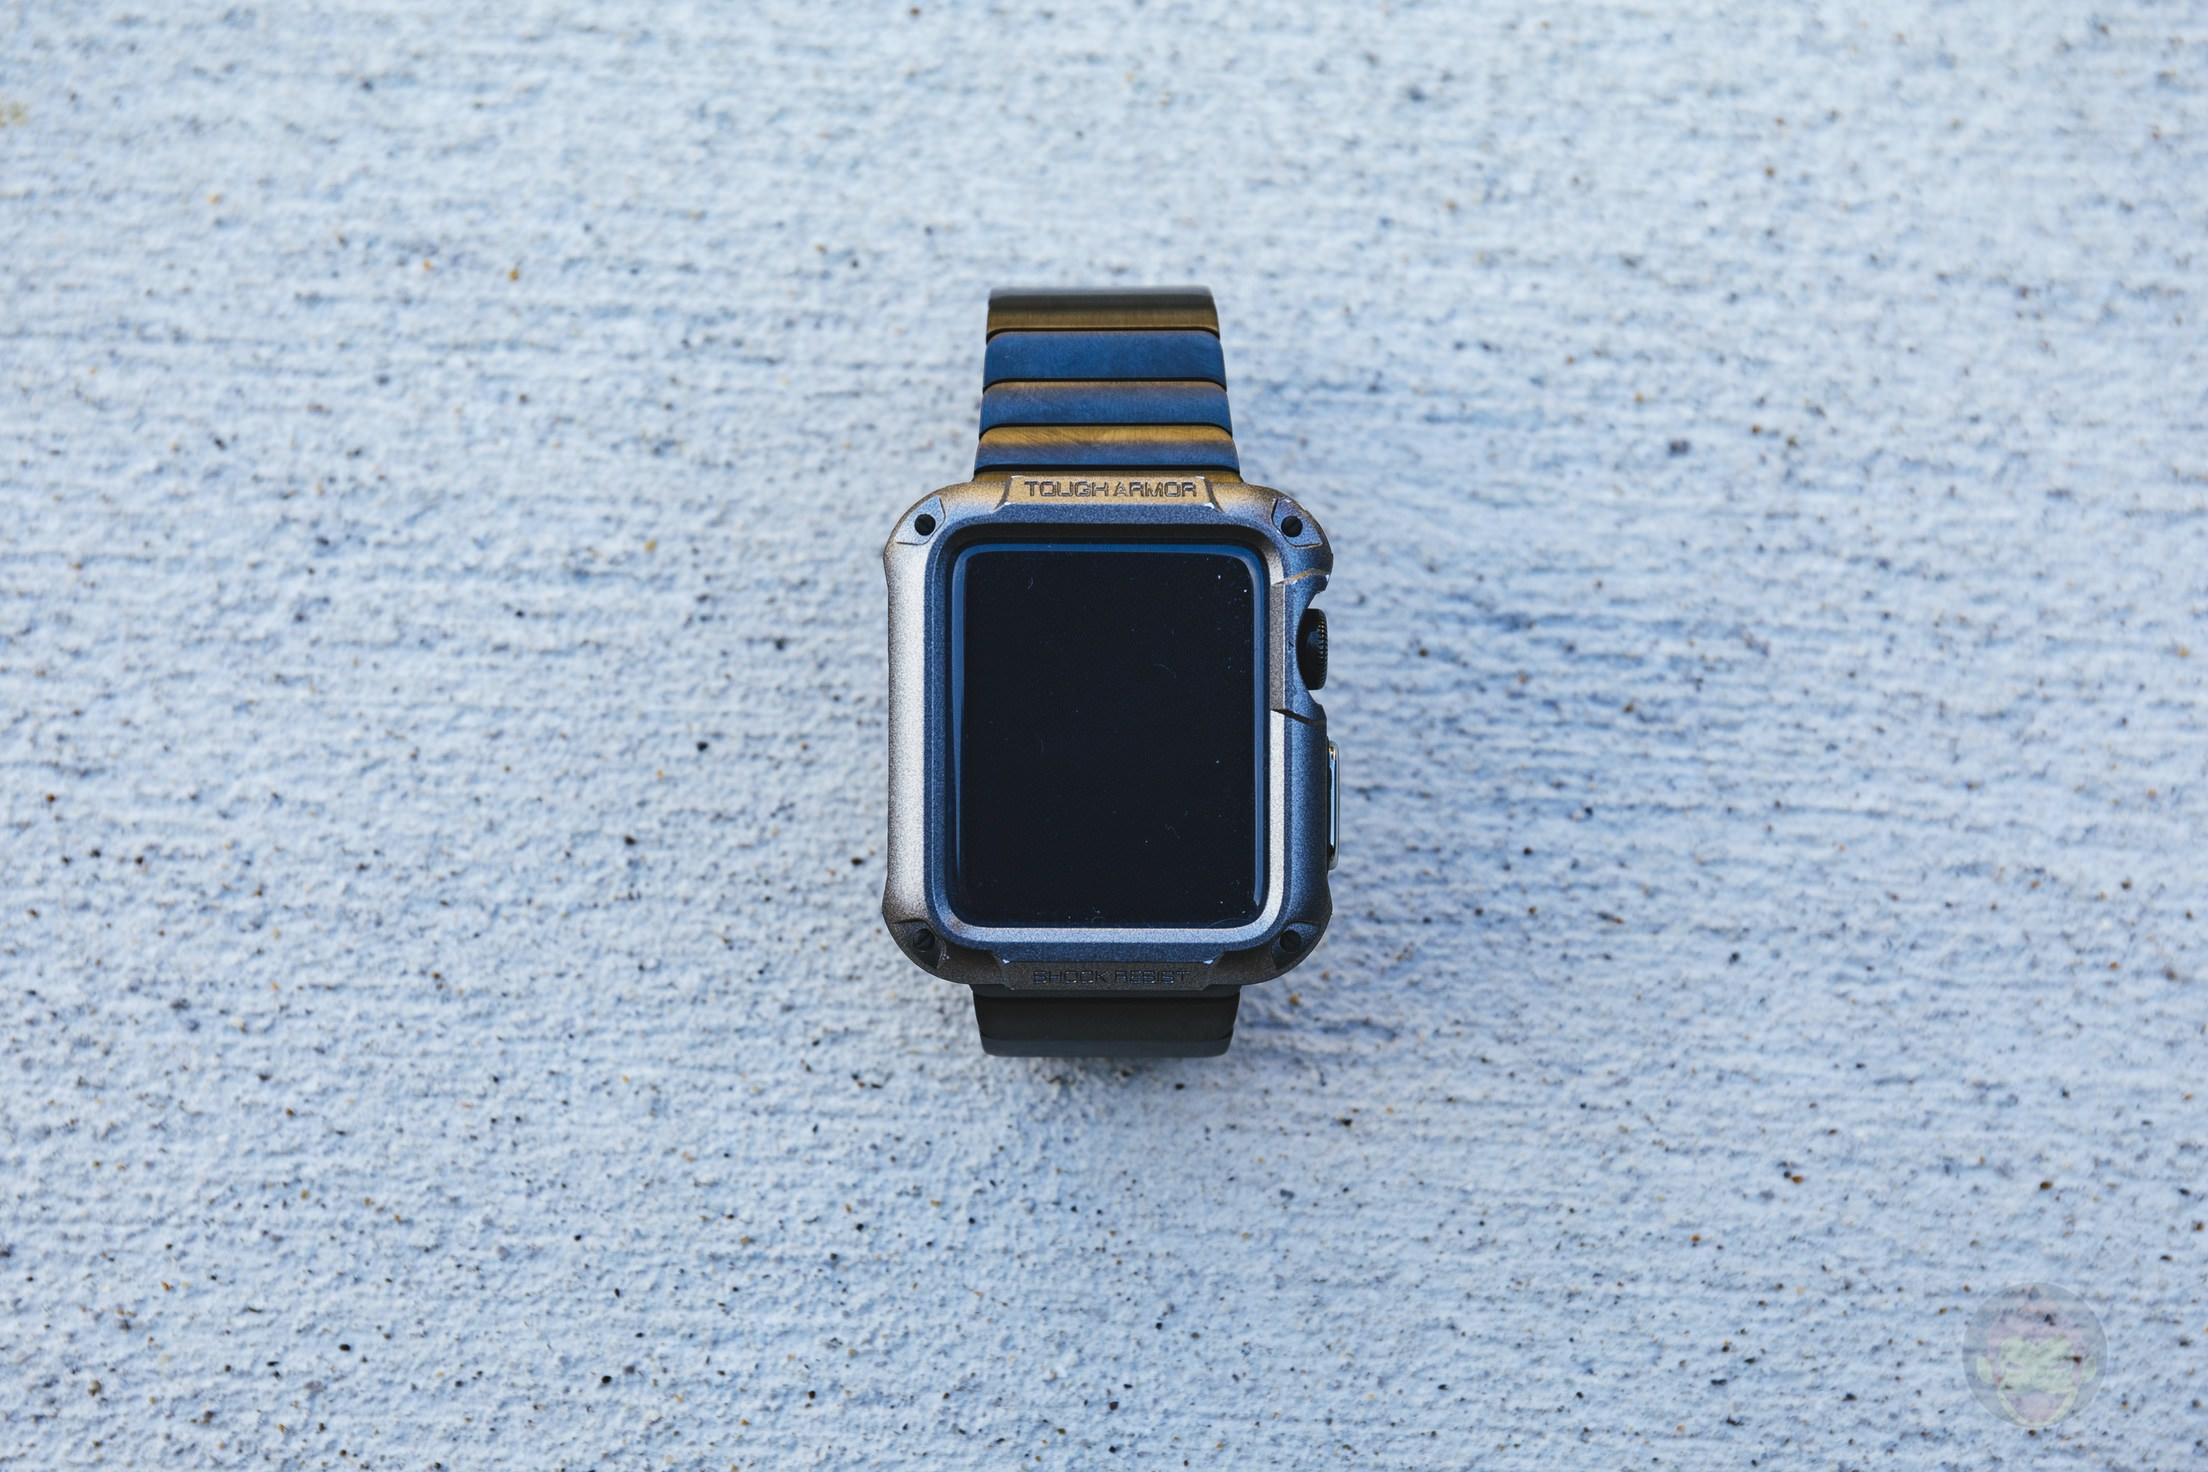 Apple-Watch-Series-3-LTE-Review-02.jpg